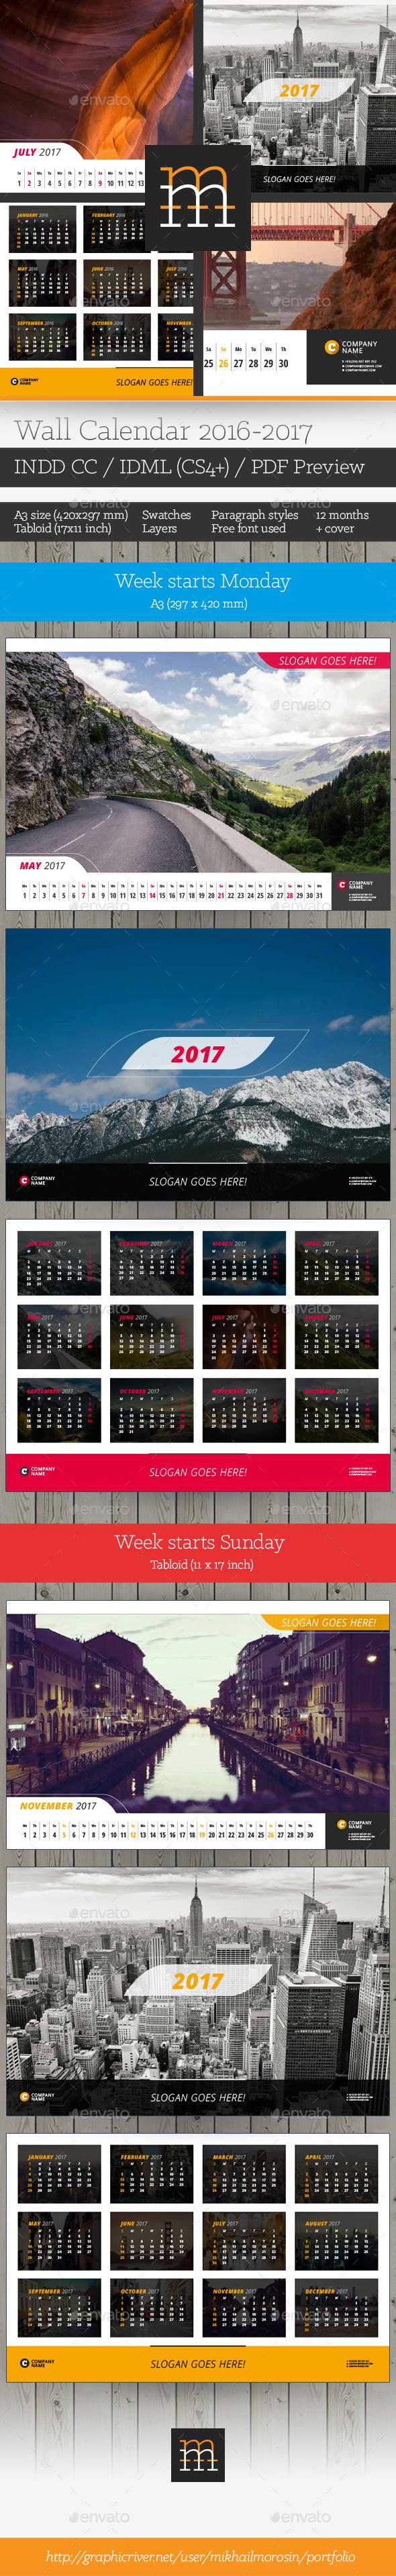 2016-2017 Wall Calendar - Calendars Stationery